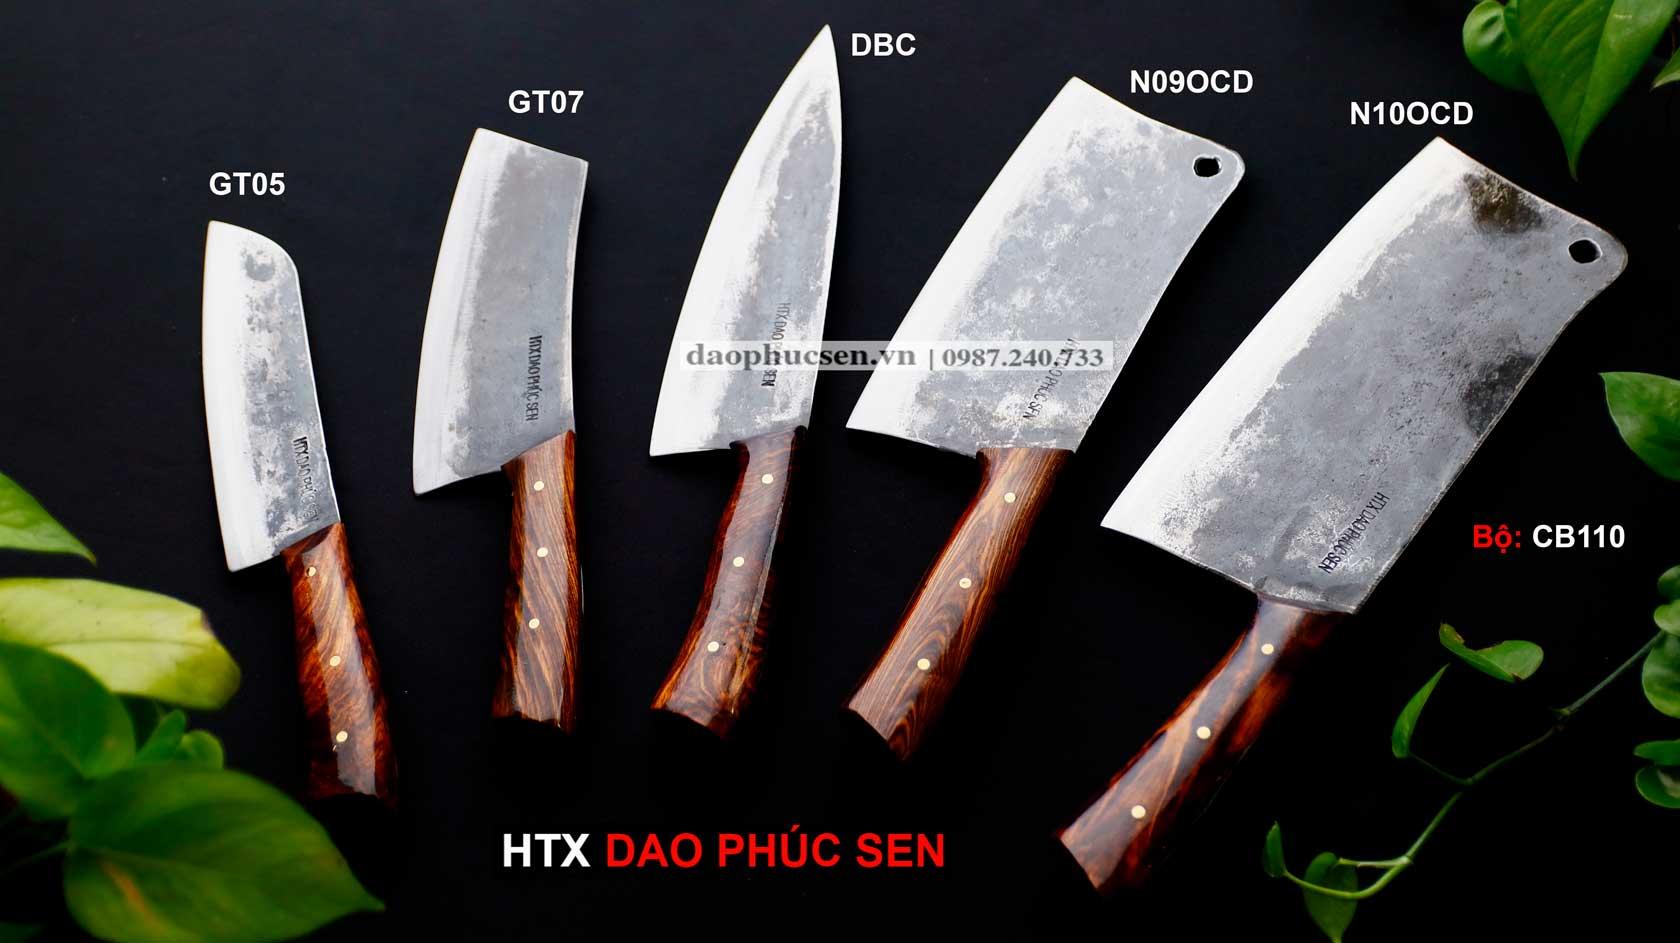 Bộ dao bếp, dao nhíp, dao phúc sen, dao phúc sen cao bằng, htx dao phúc sen